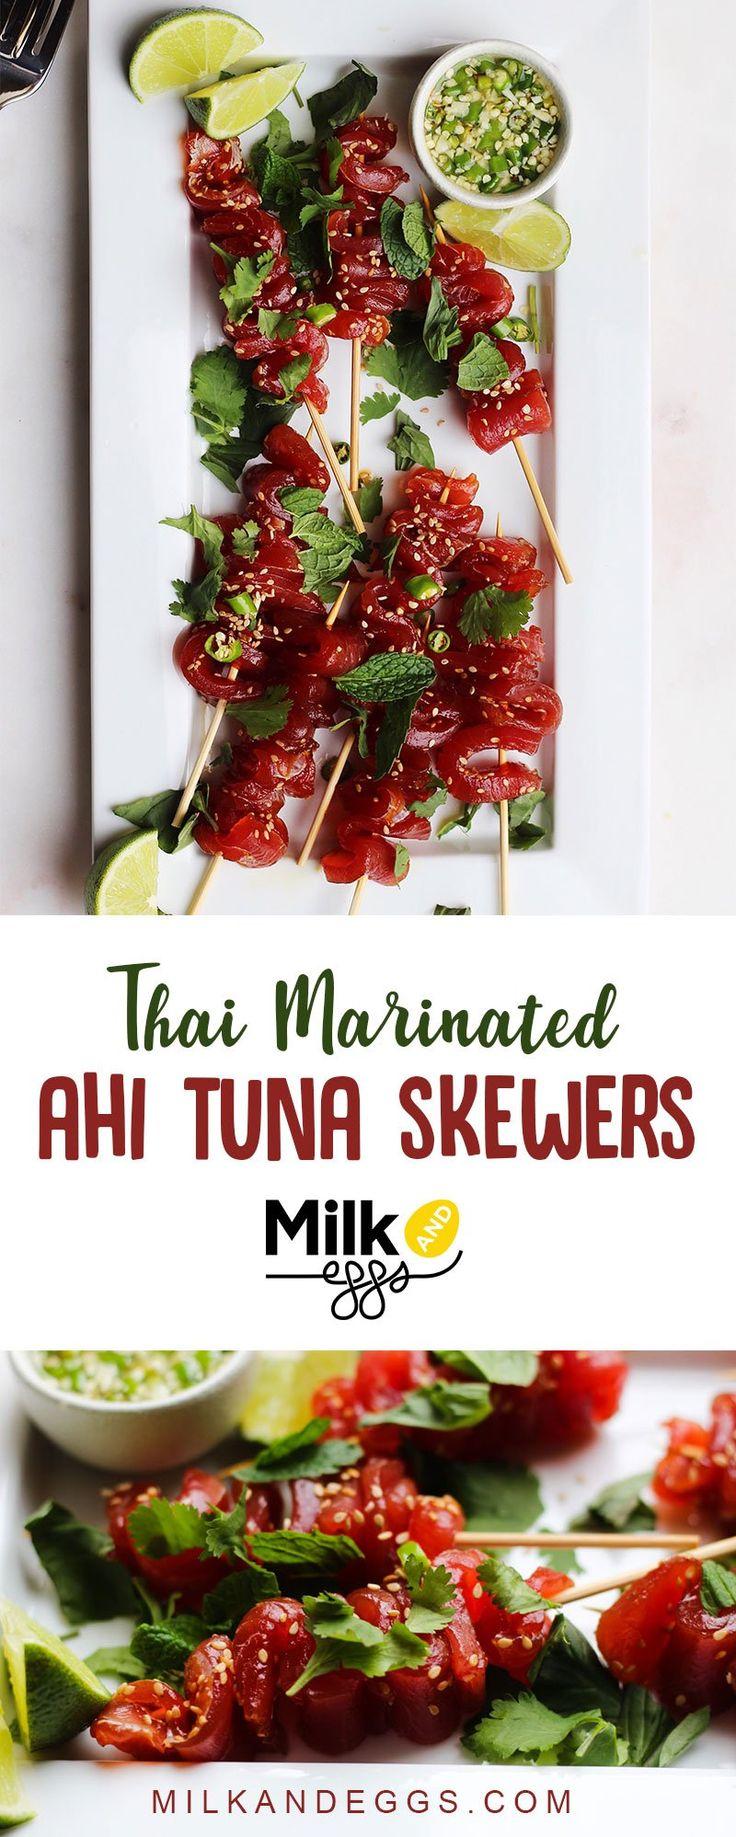 Thai Marinated Ahi Tuna Skewers – Milk and Eggs